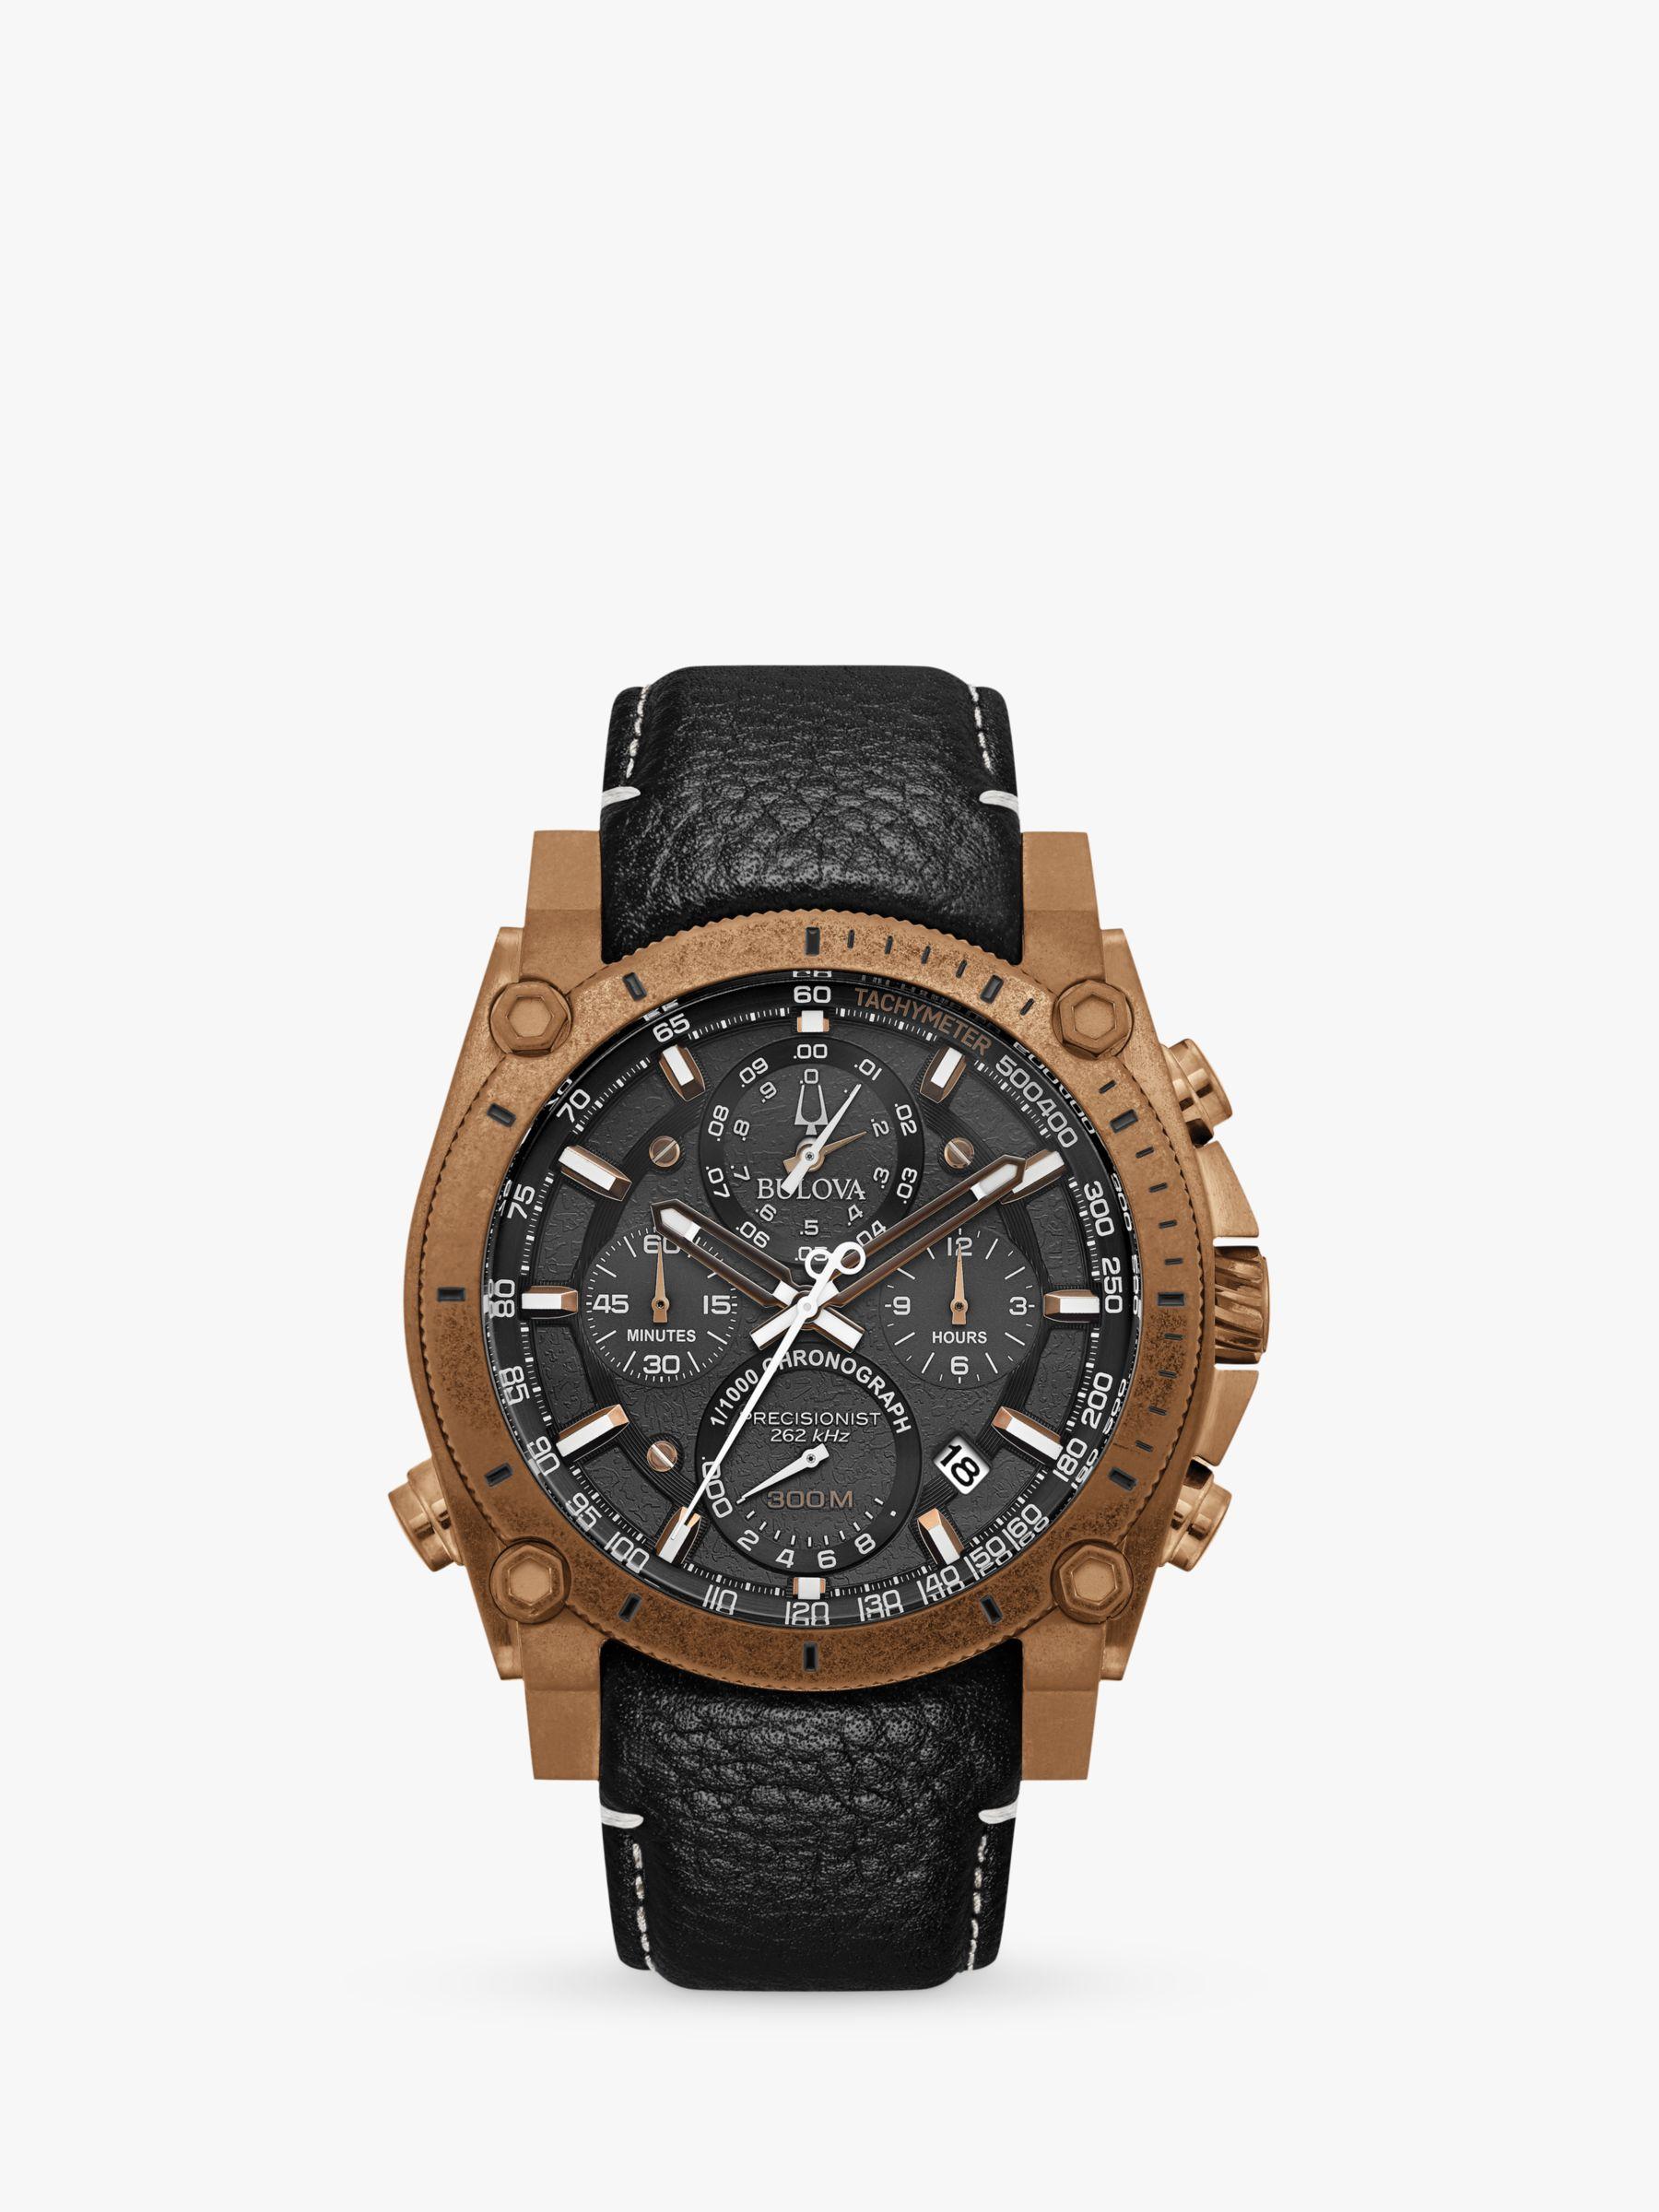 Bulova Bulova 97B188 Men's Precisionist Chronograph Date Leather Strap Watch, Black